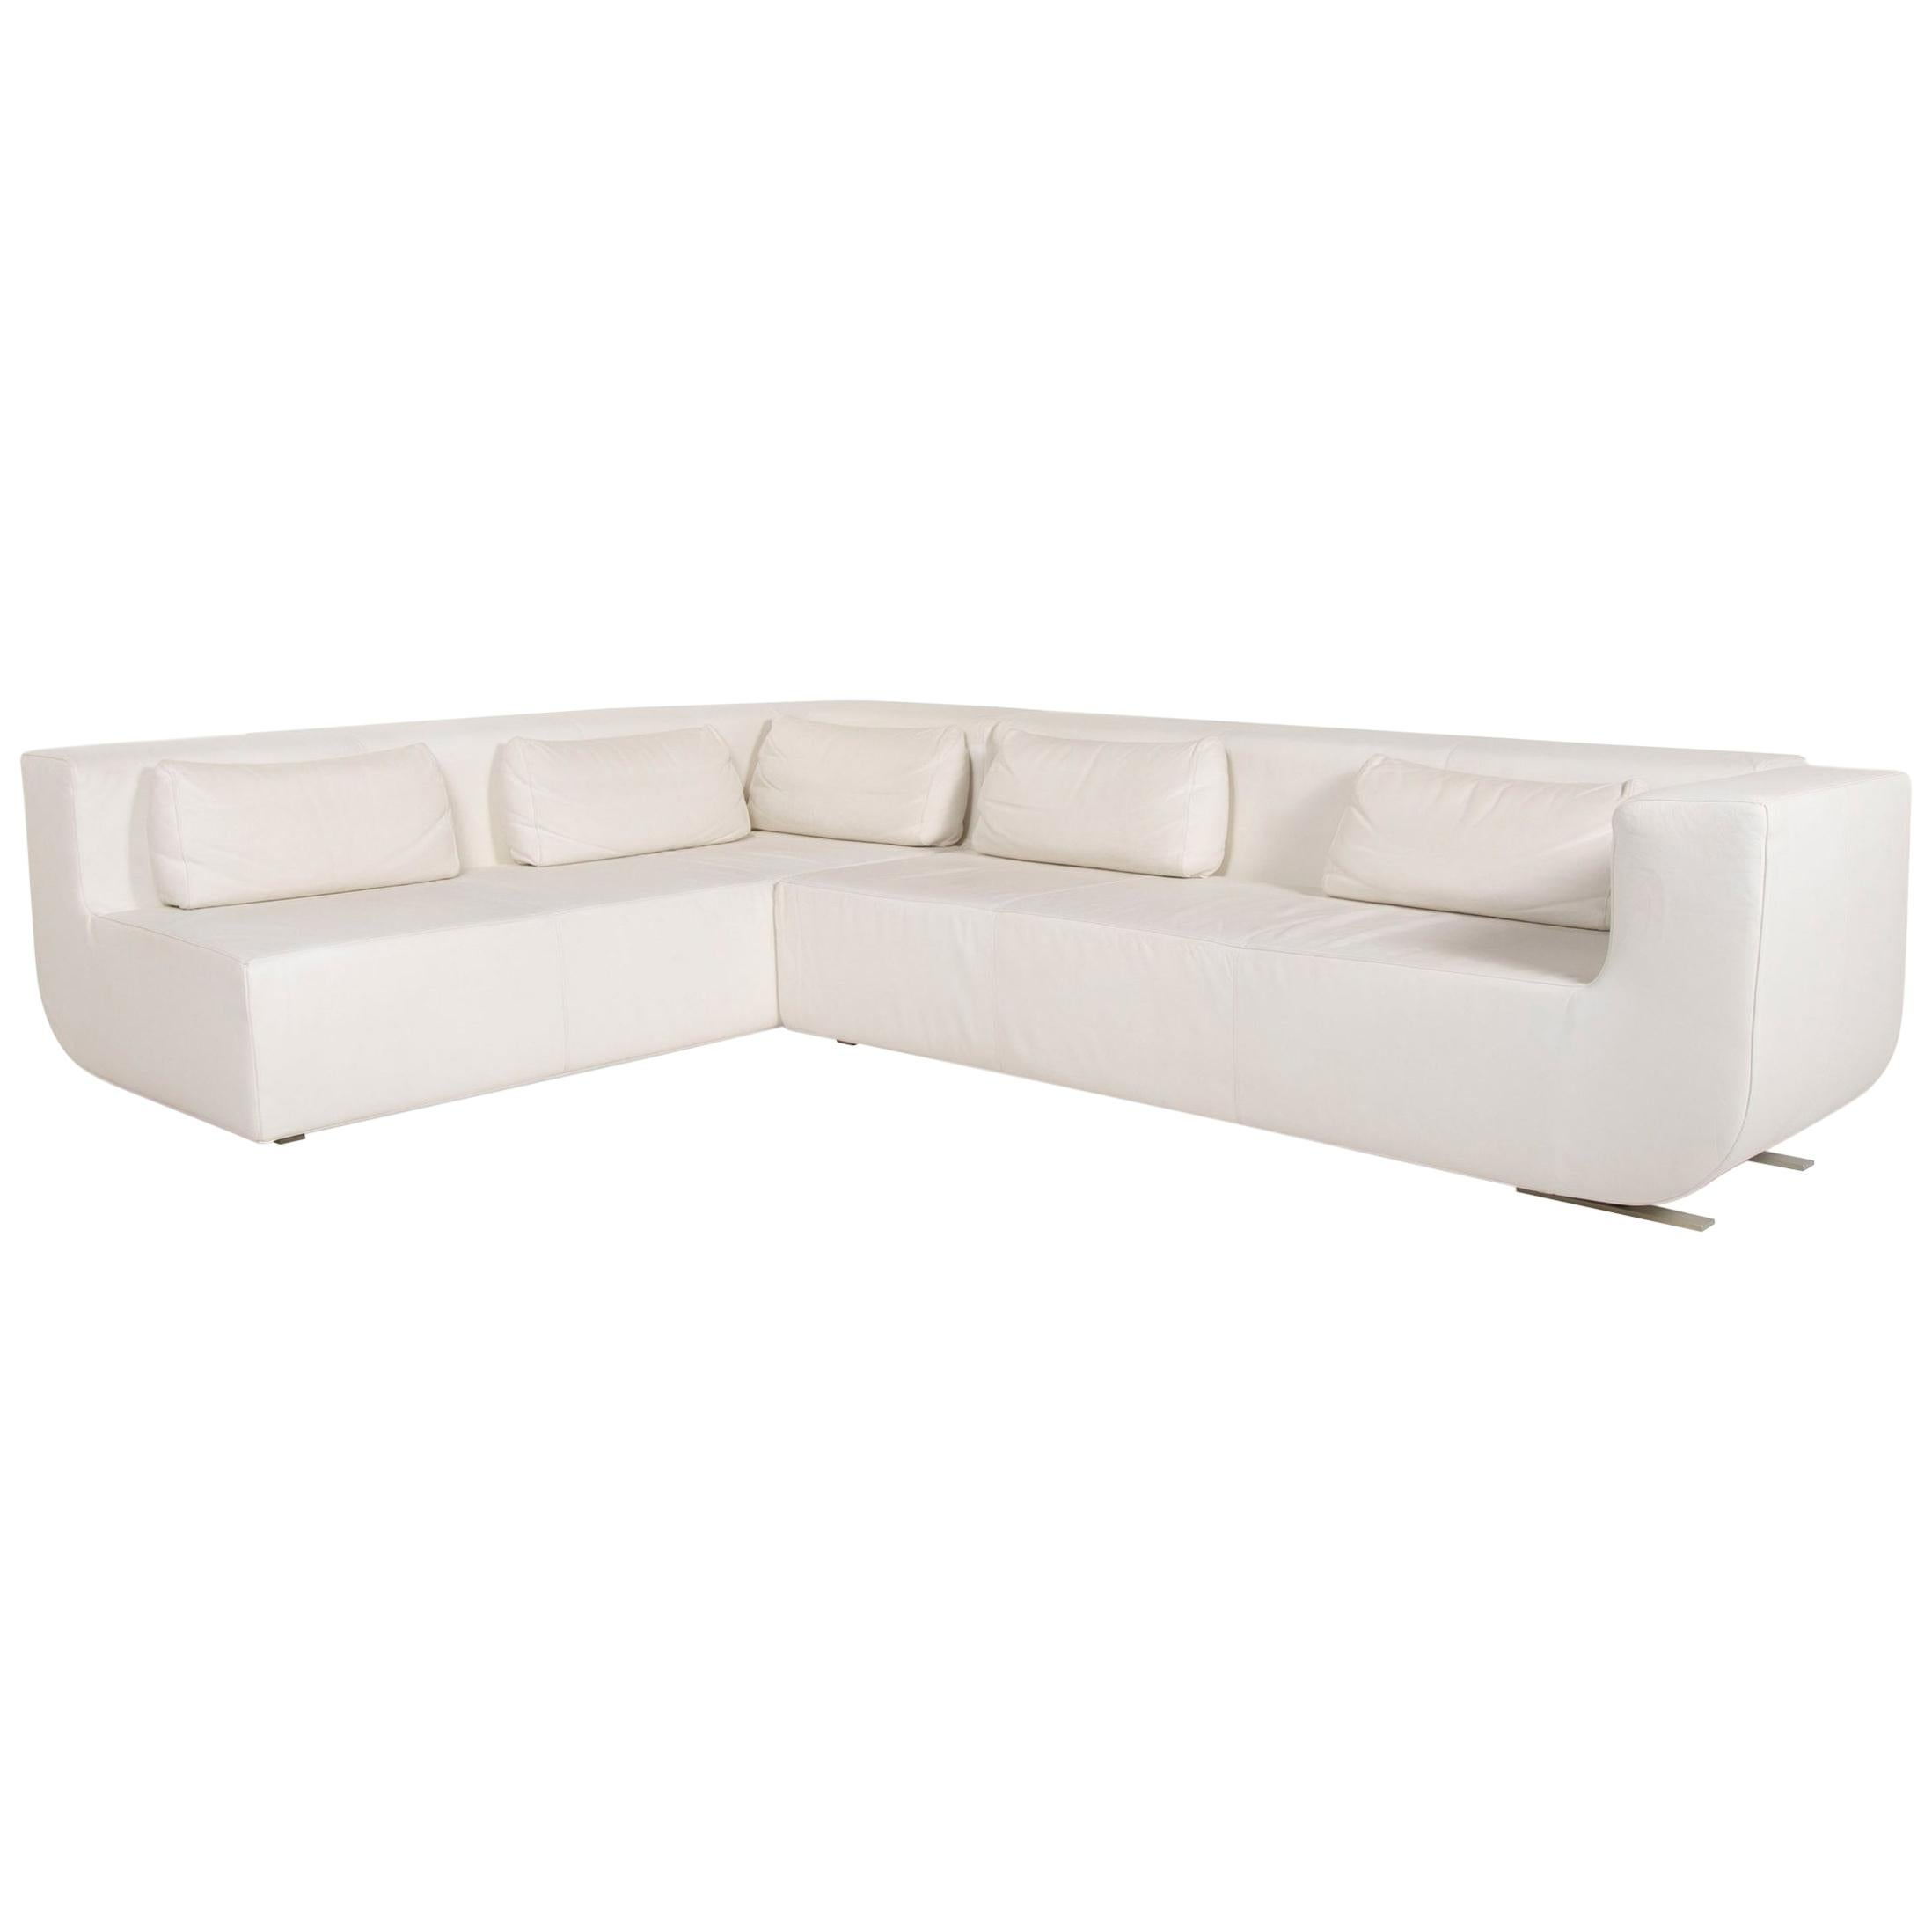 COR Nuba Leather Corner Sofa Cream Sofa Couch